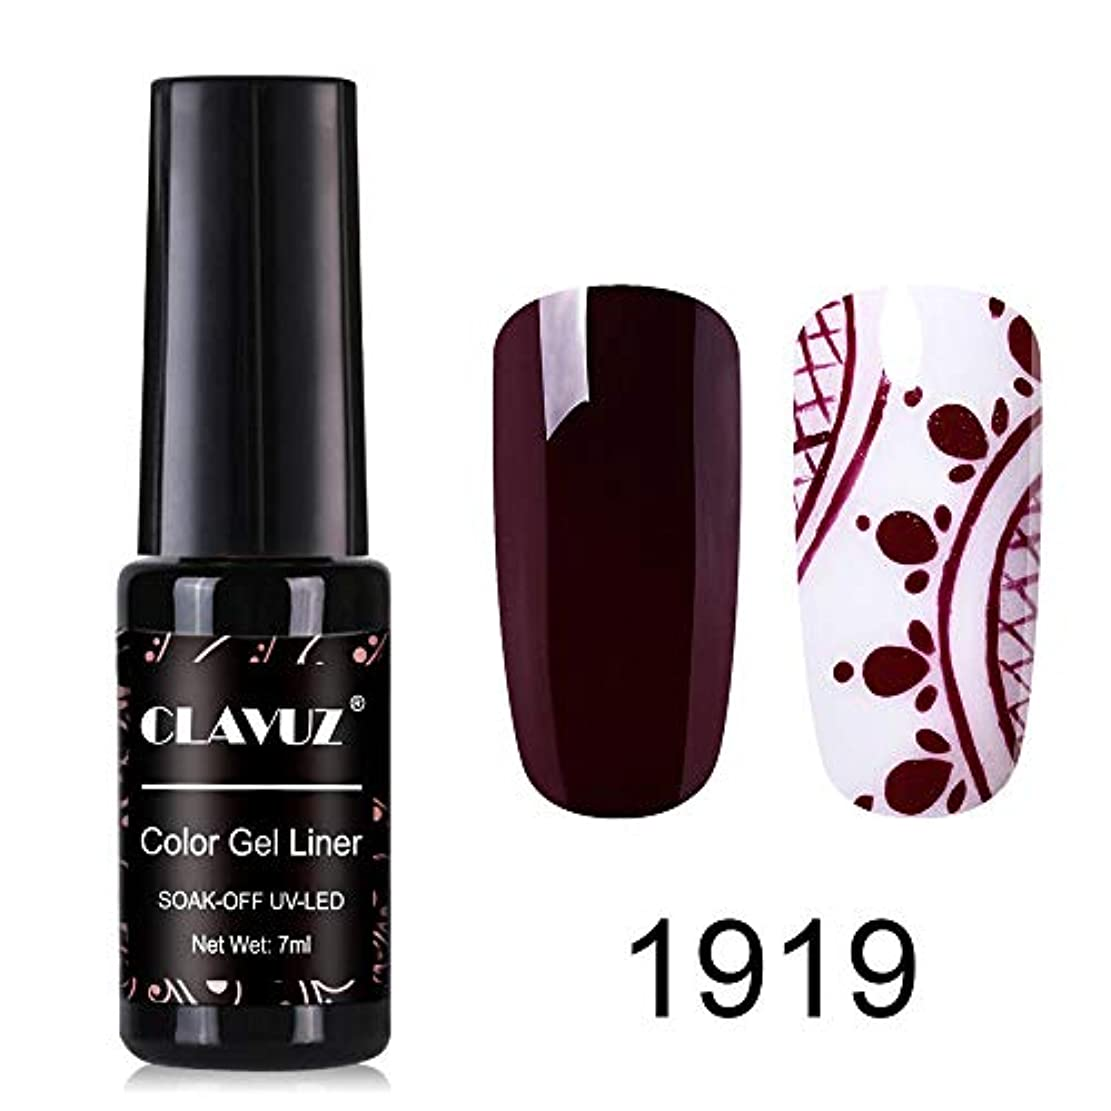 Clavuz ジェルネイル カラージェル ライナージェル 細いブラシタイプ 1色入り 7ml【全30色選択可】